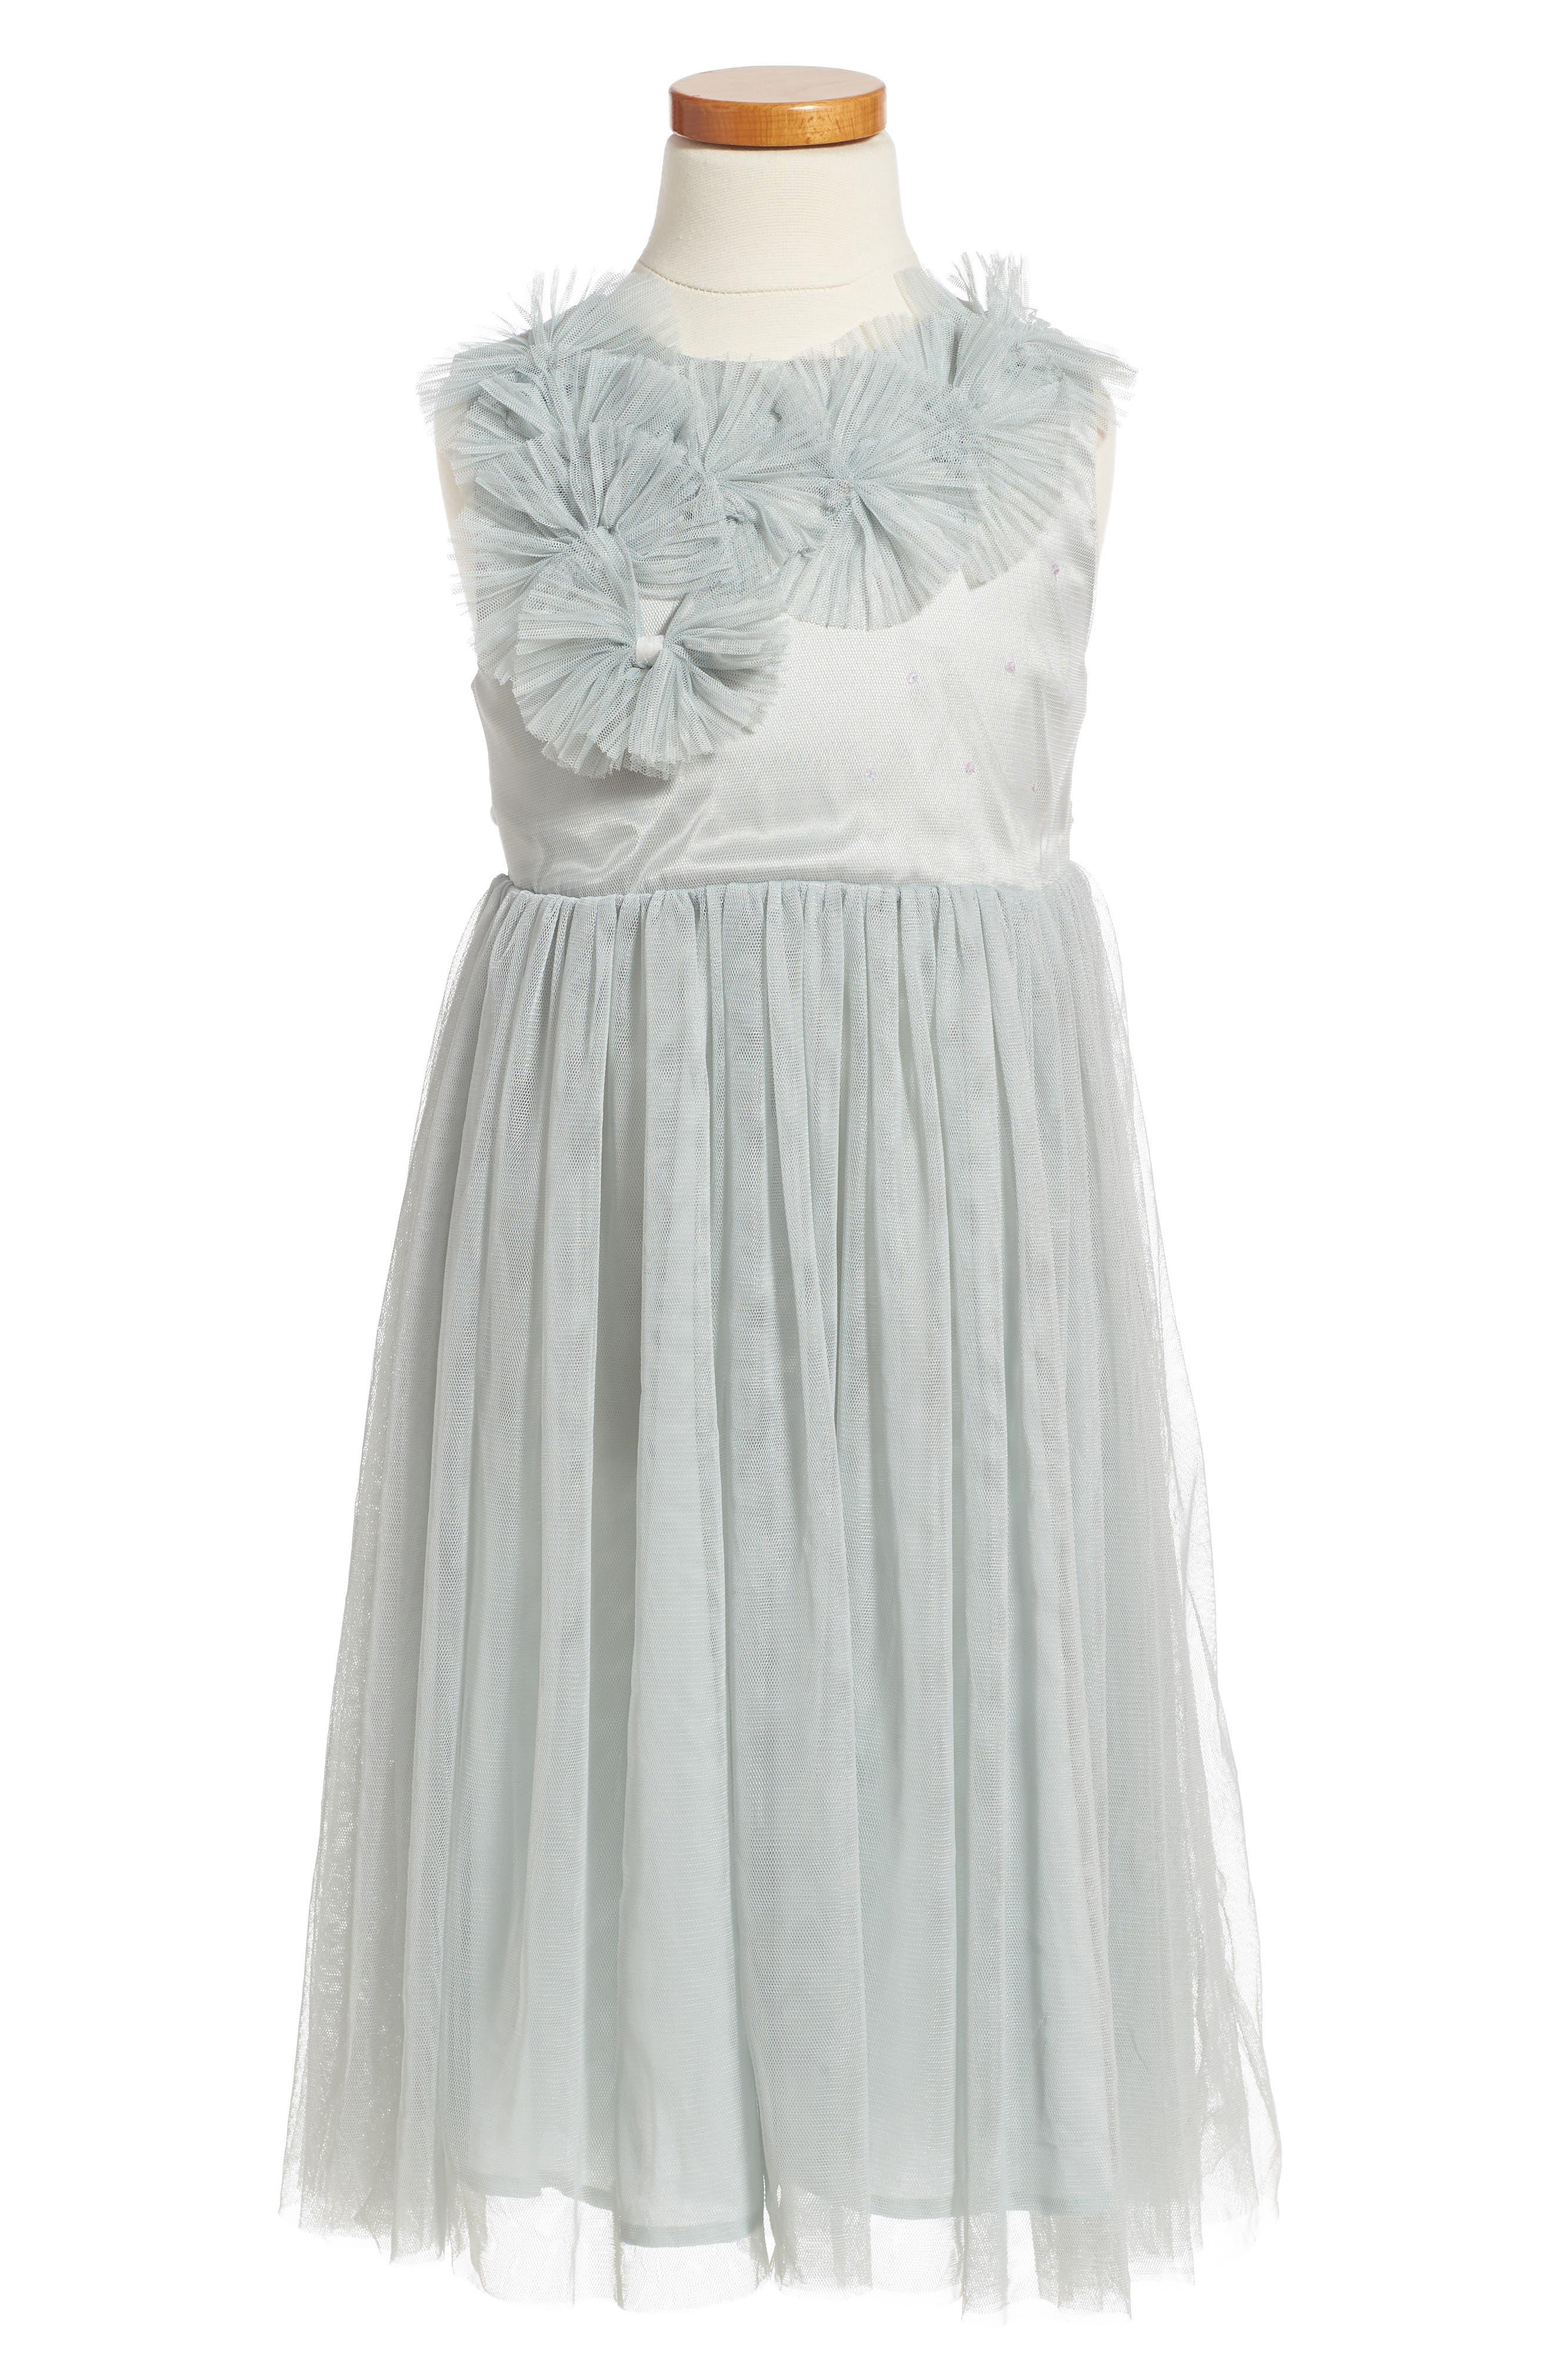 Main Image - Popatu Sleeveless Tulle Dress (Toddler Girls, Little Girls & Big Girls)